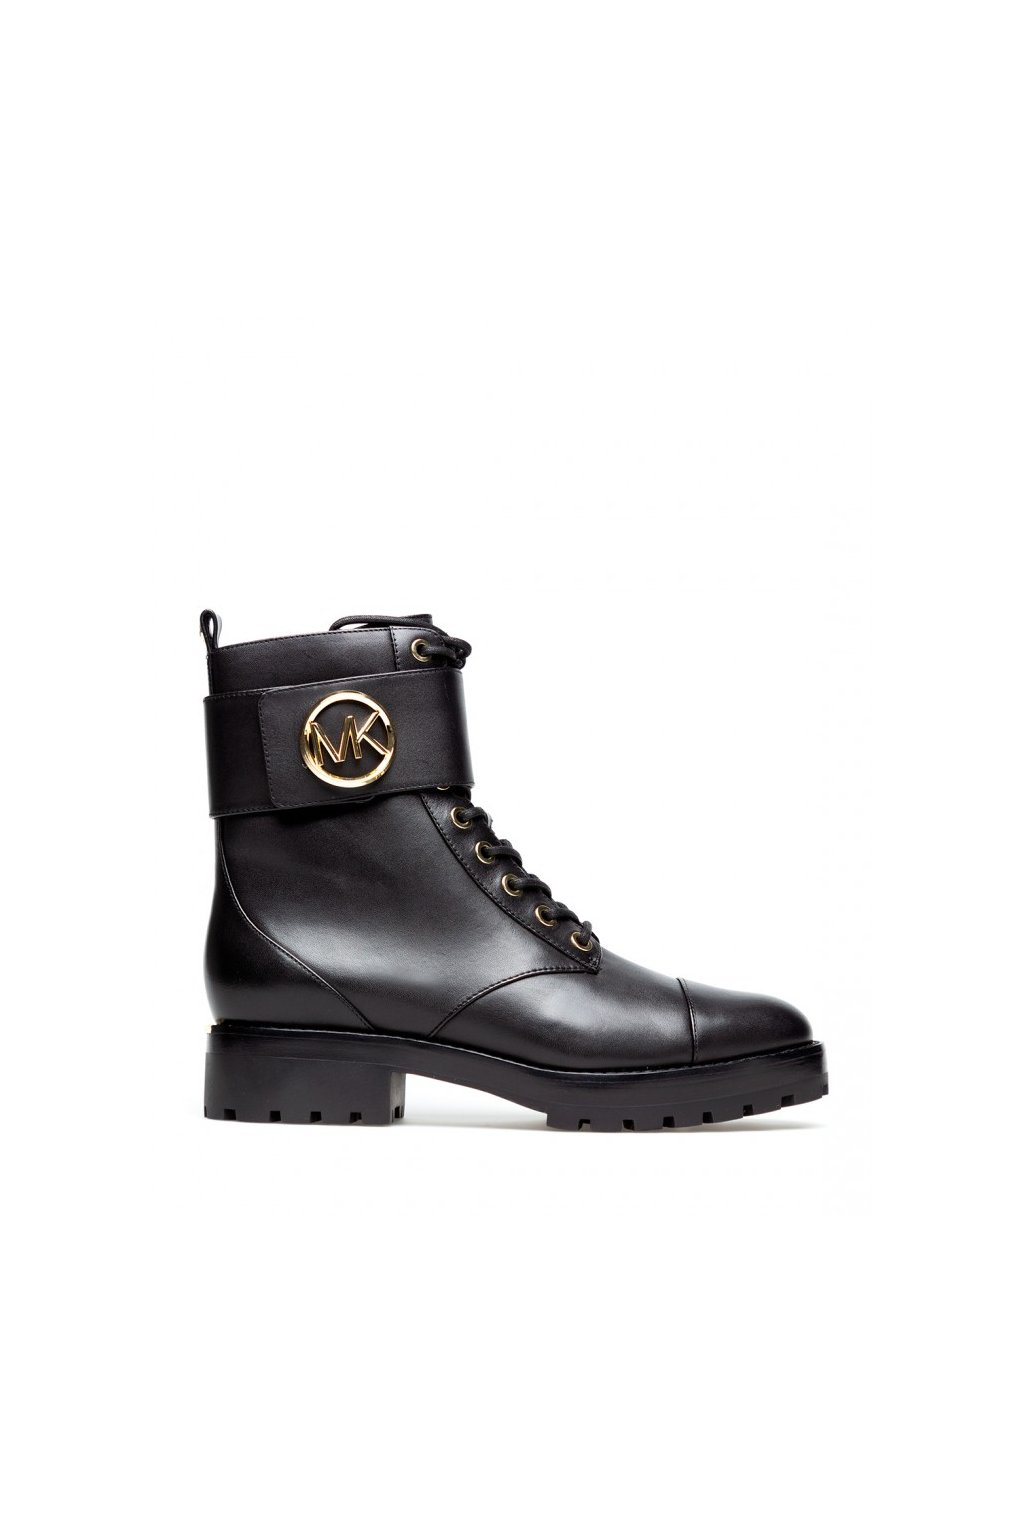 Dámské boty Michael Kors Tatum 40F0TAFB5L černé